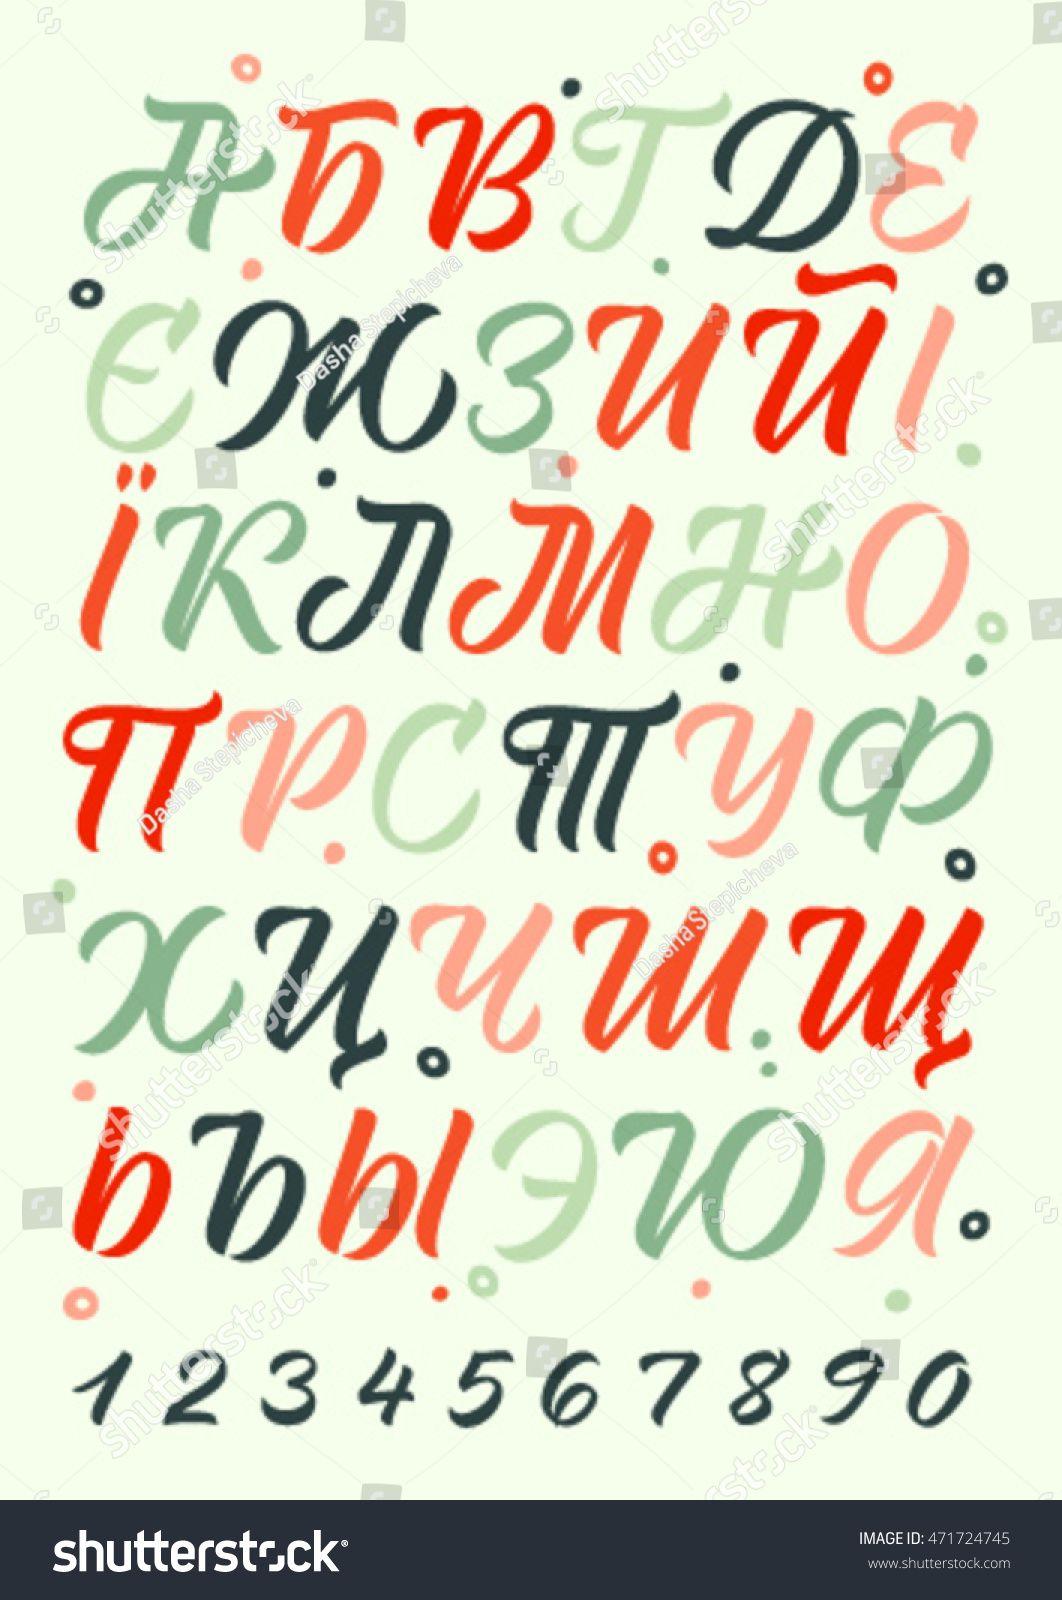 Vector Cyrillic Alphabet Russian And Ukrainian Letters